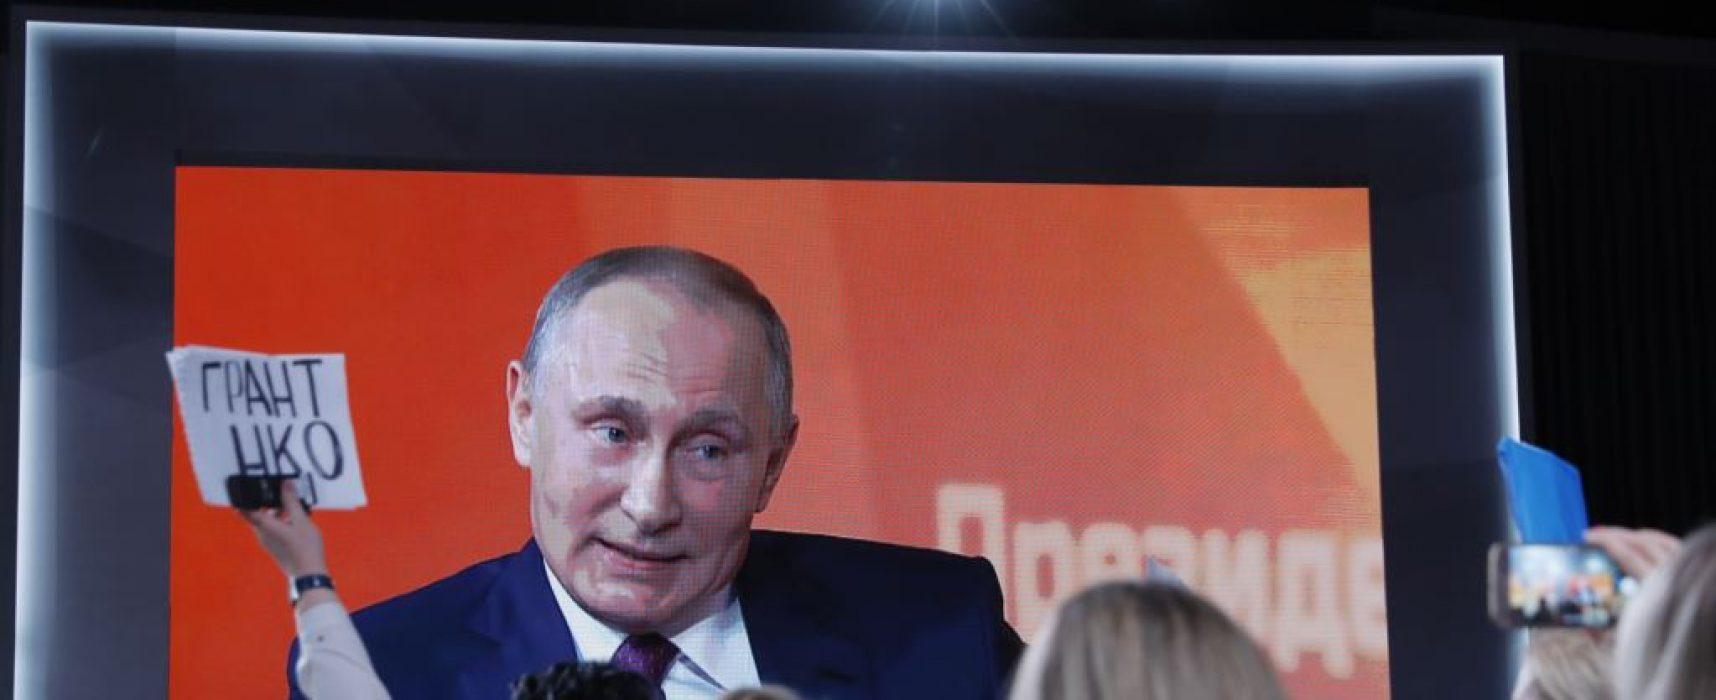 Vladimir Putin Repeats Already Fact-Checked Claims